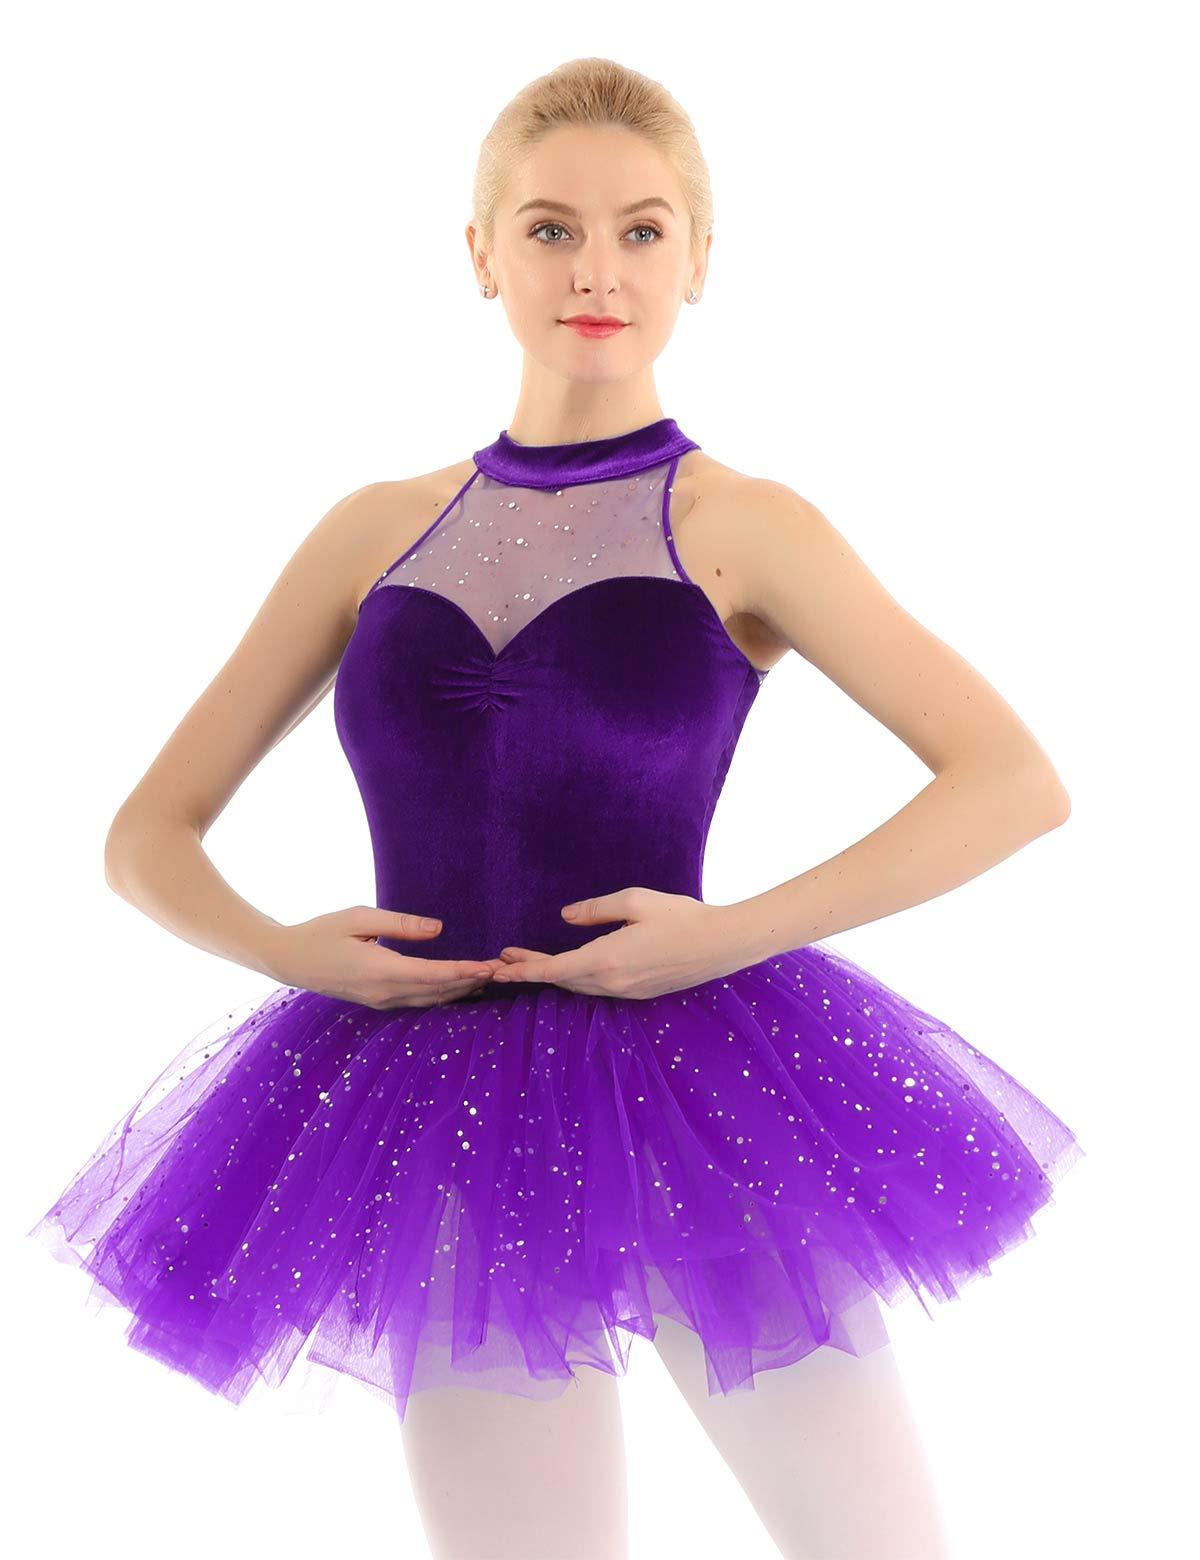 iiniim Women's Ballet Tutu Costume Black Swan Lake Dance Leotard Dress Purple Sequins XL by iiniim